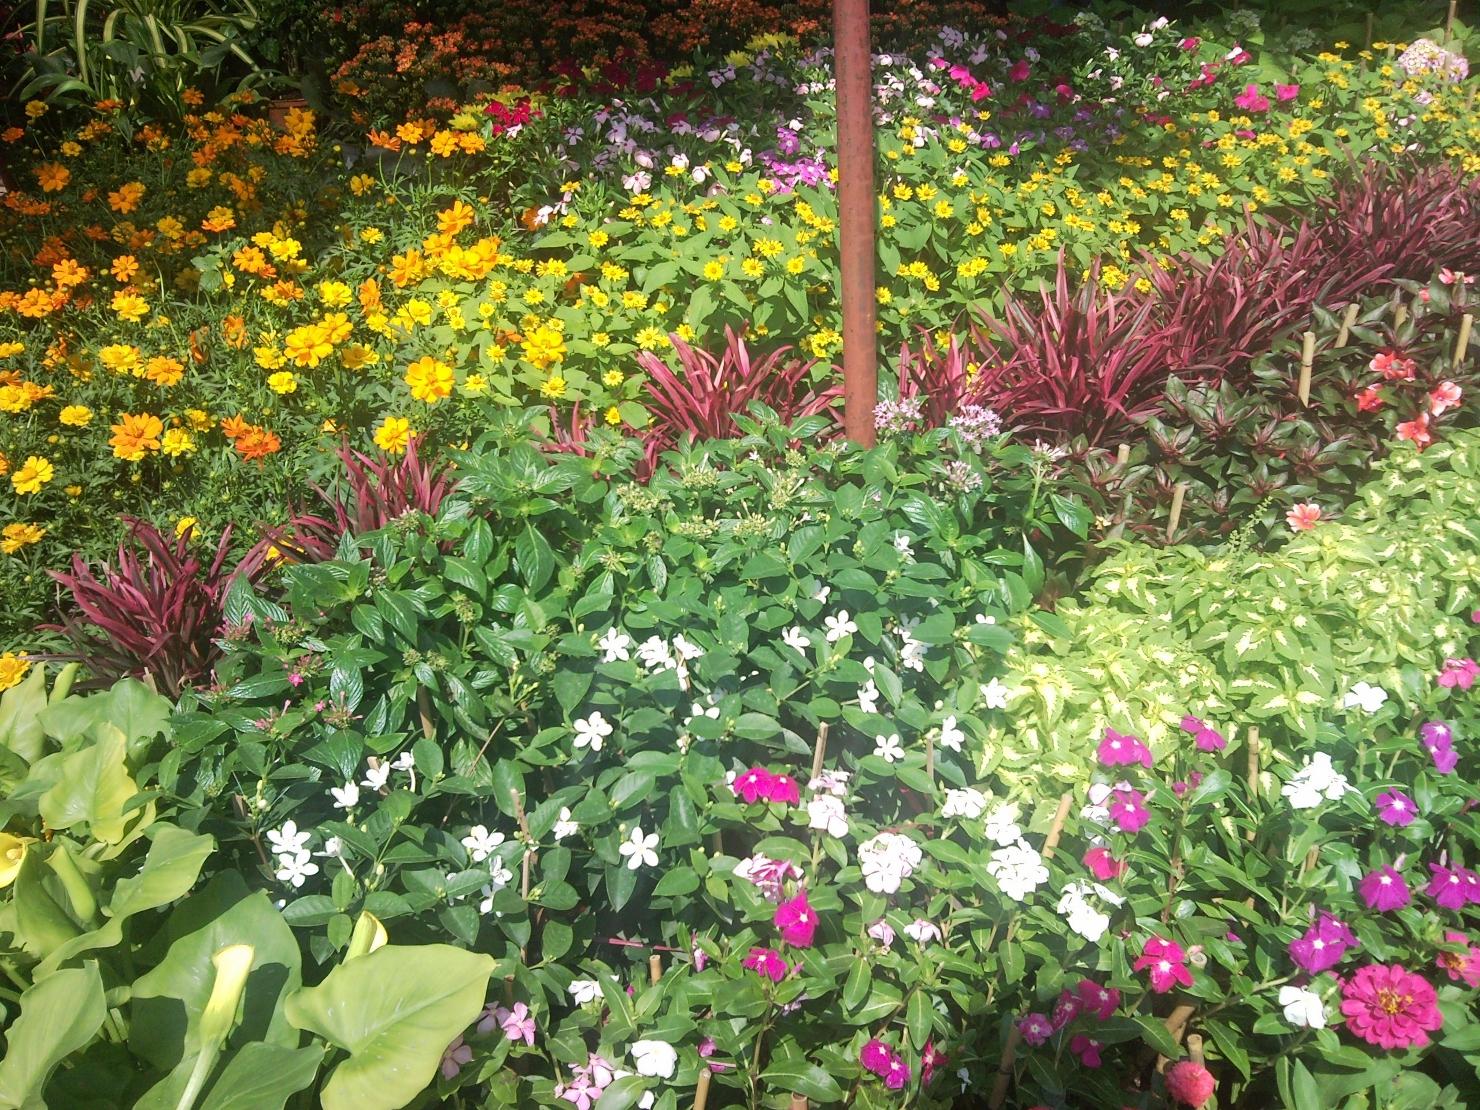 Vườn ươm cây có hoa